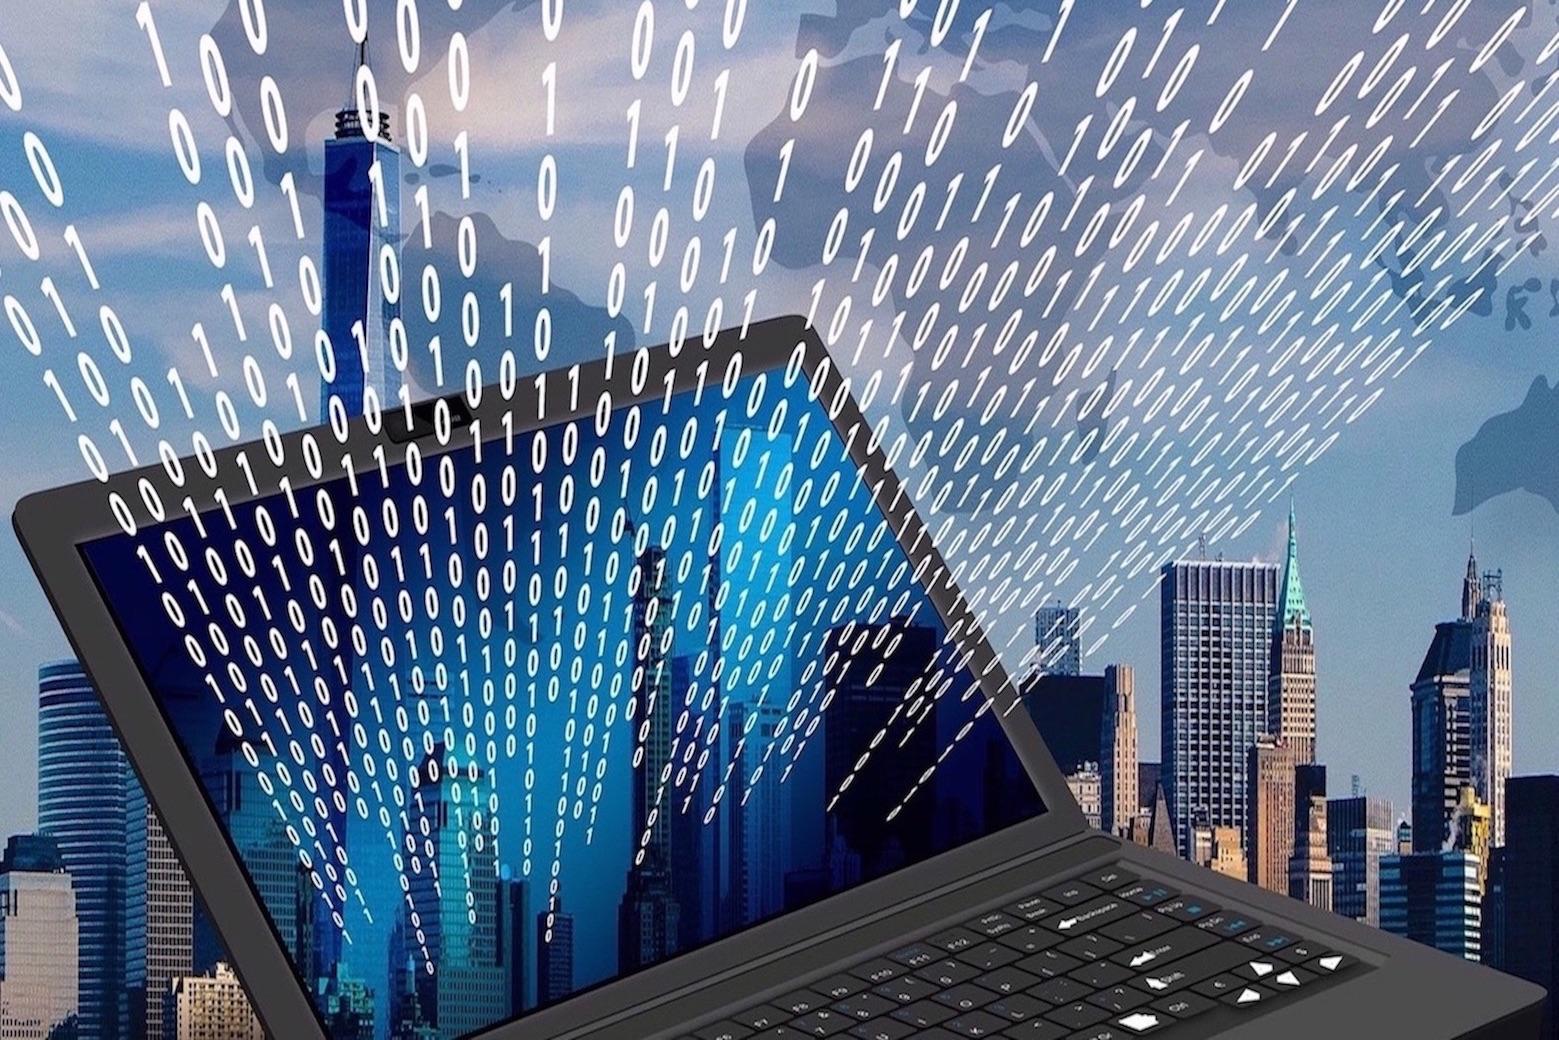 Tecnologias de administración de datos